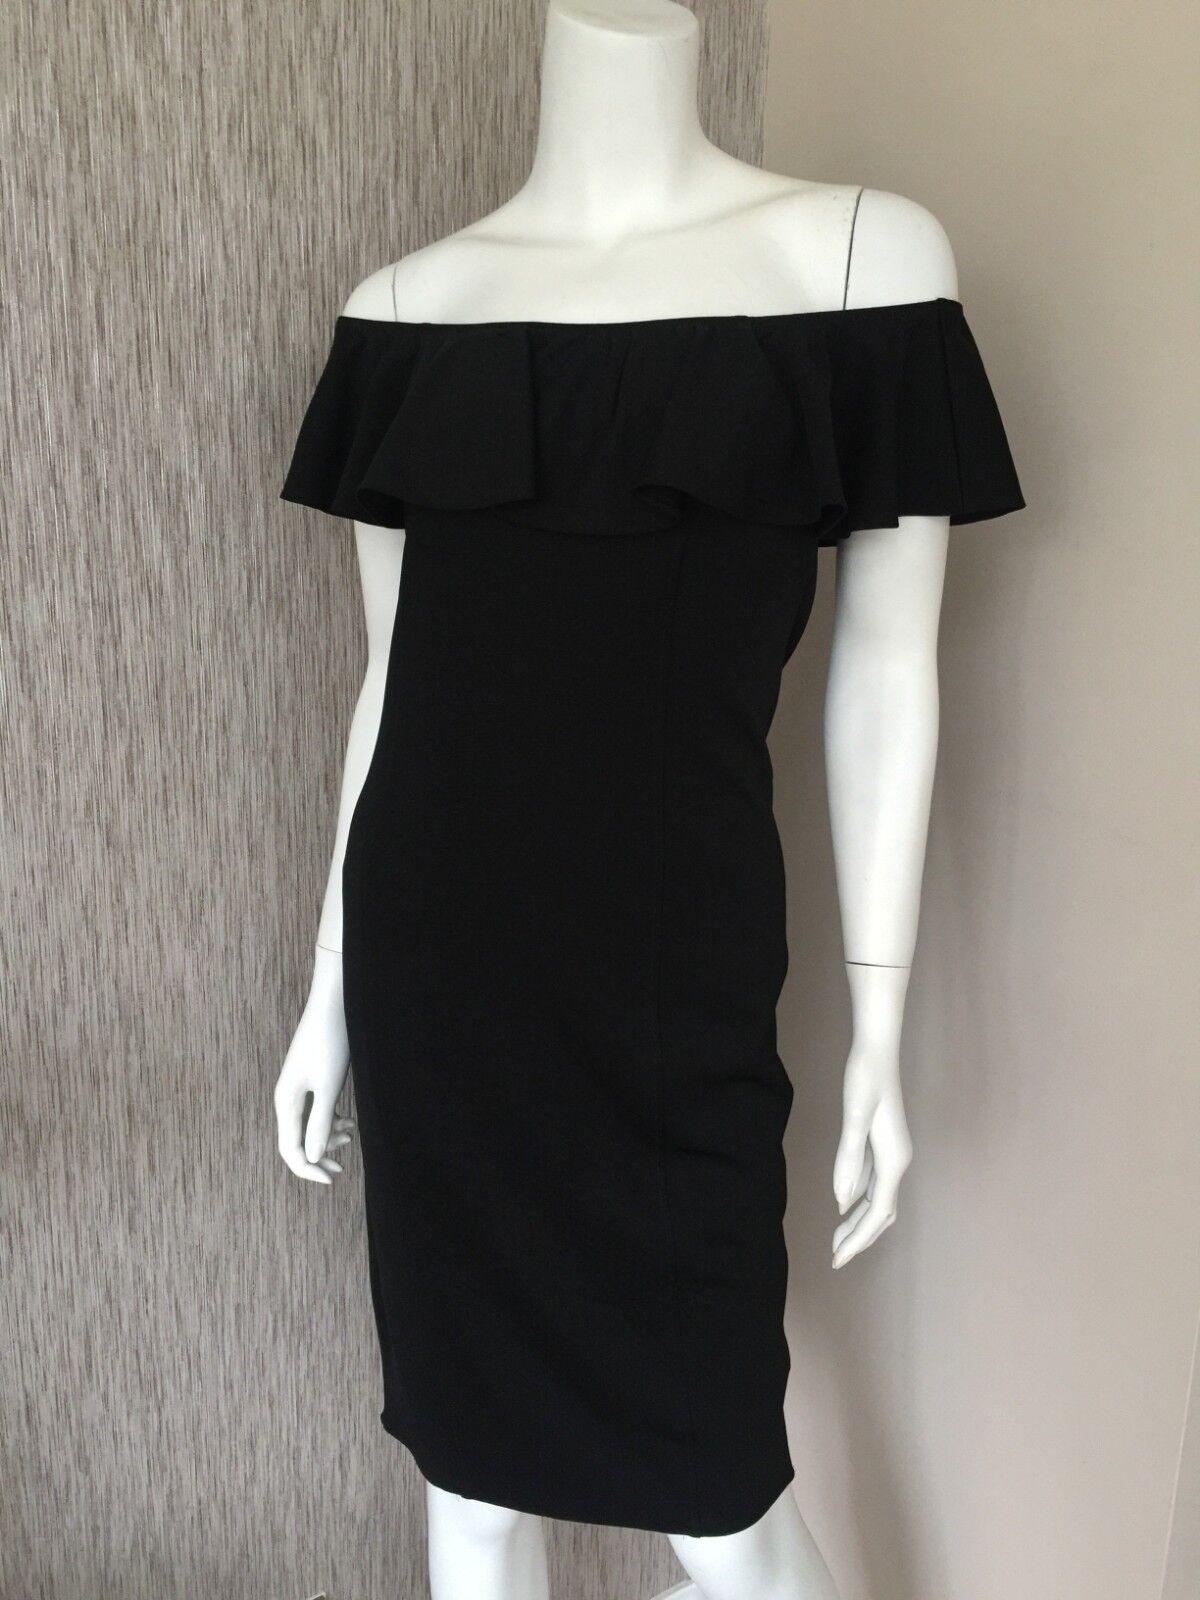 RALPH LAUREN schwarz BARDOT BODYCON DRESS Größe UK 8-10 RETAIL